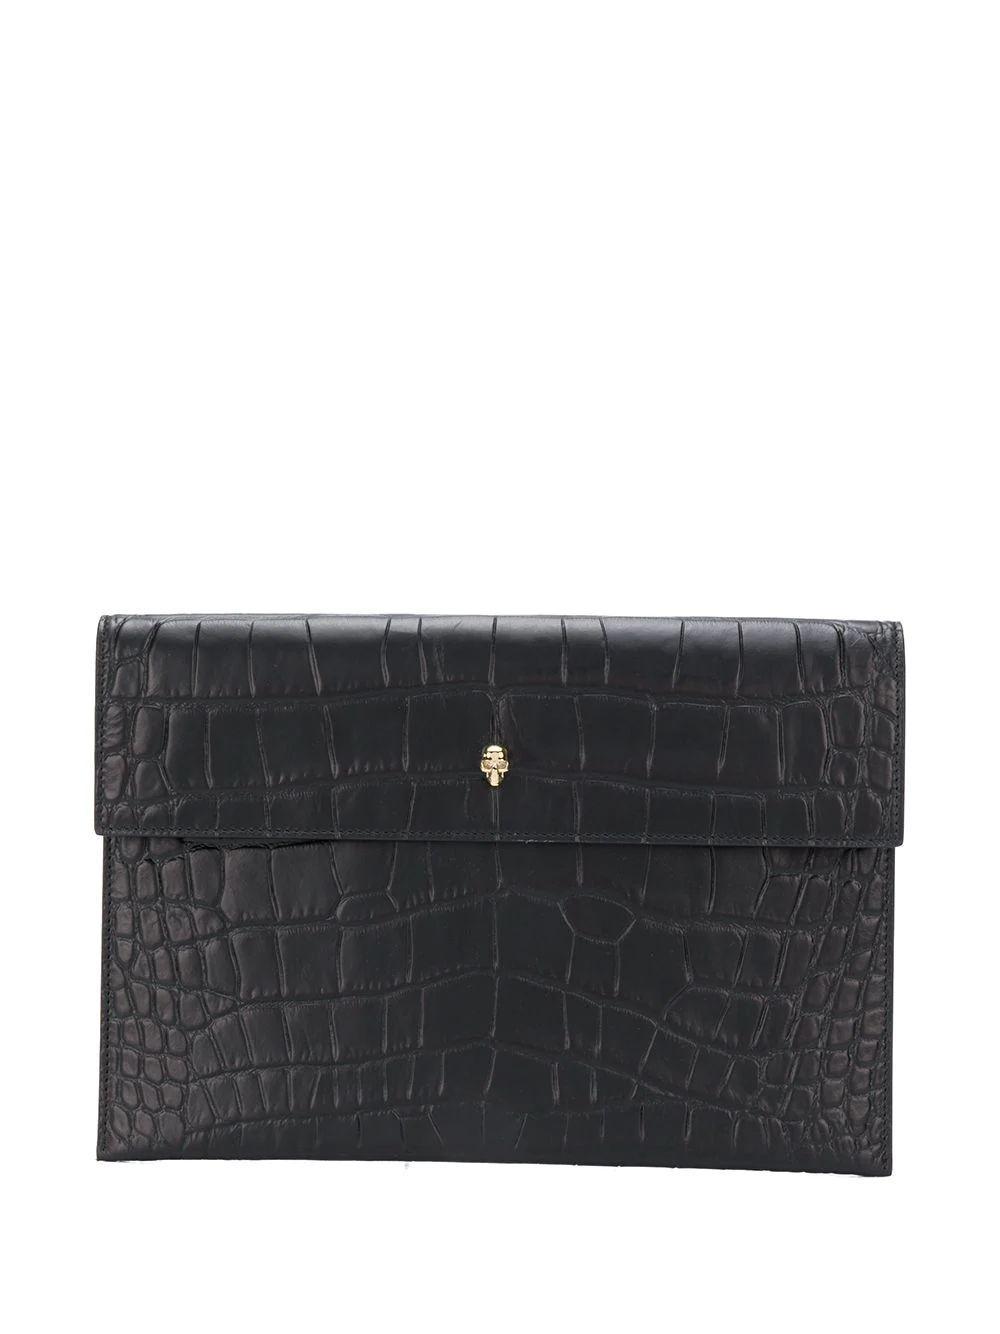 Shiny Crocodile Envelope Pouch Item # 6320331JMEG